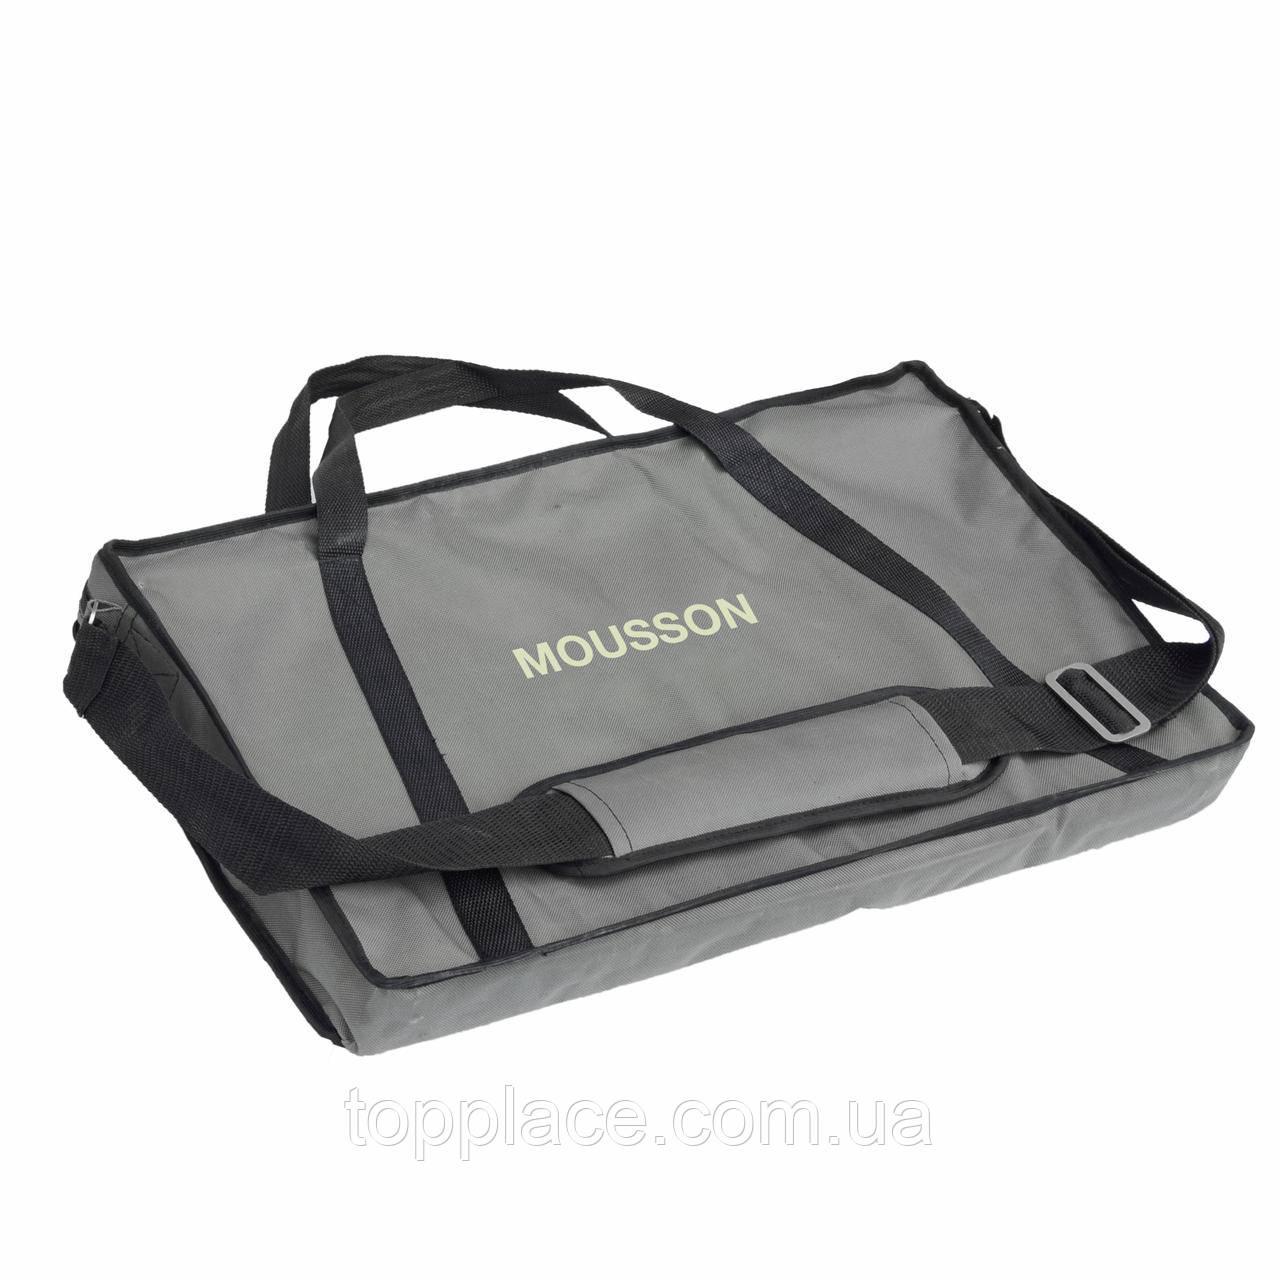 Сумка для мангала MOUSSON B10 (7963)